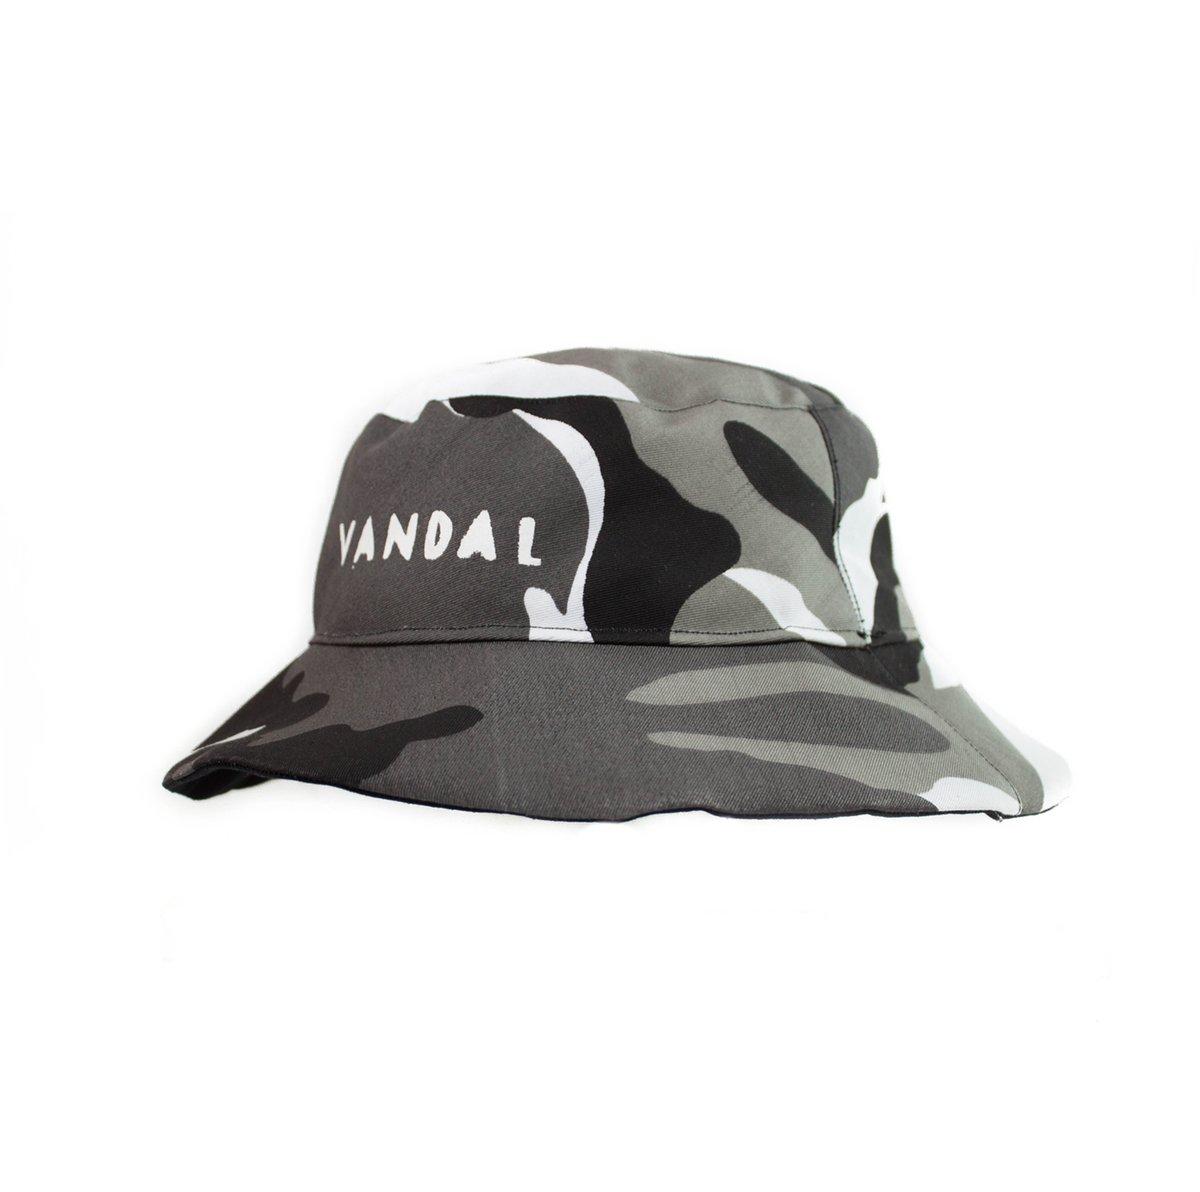 Image of VANDAL CAMO HAT